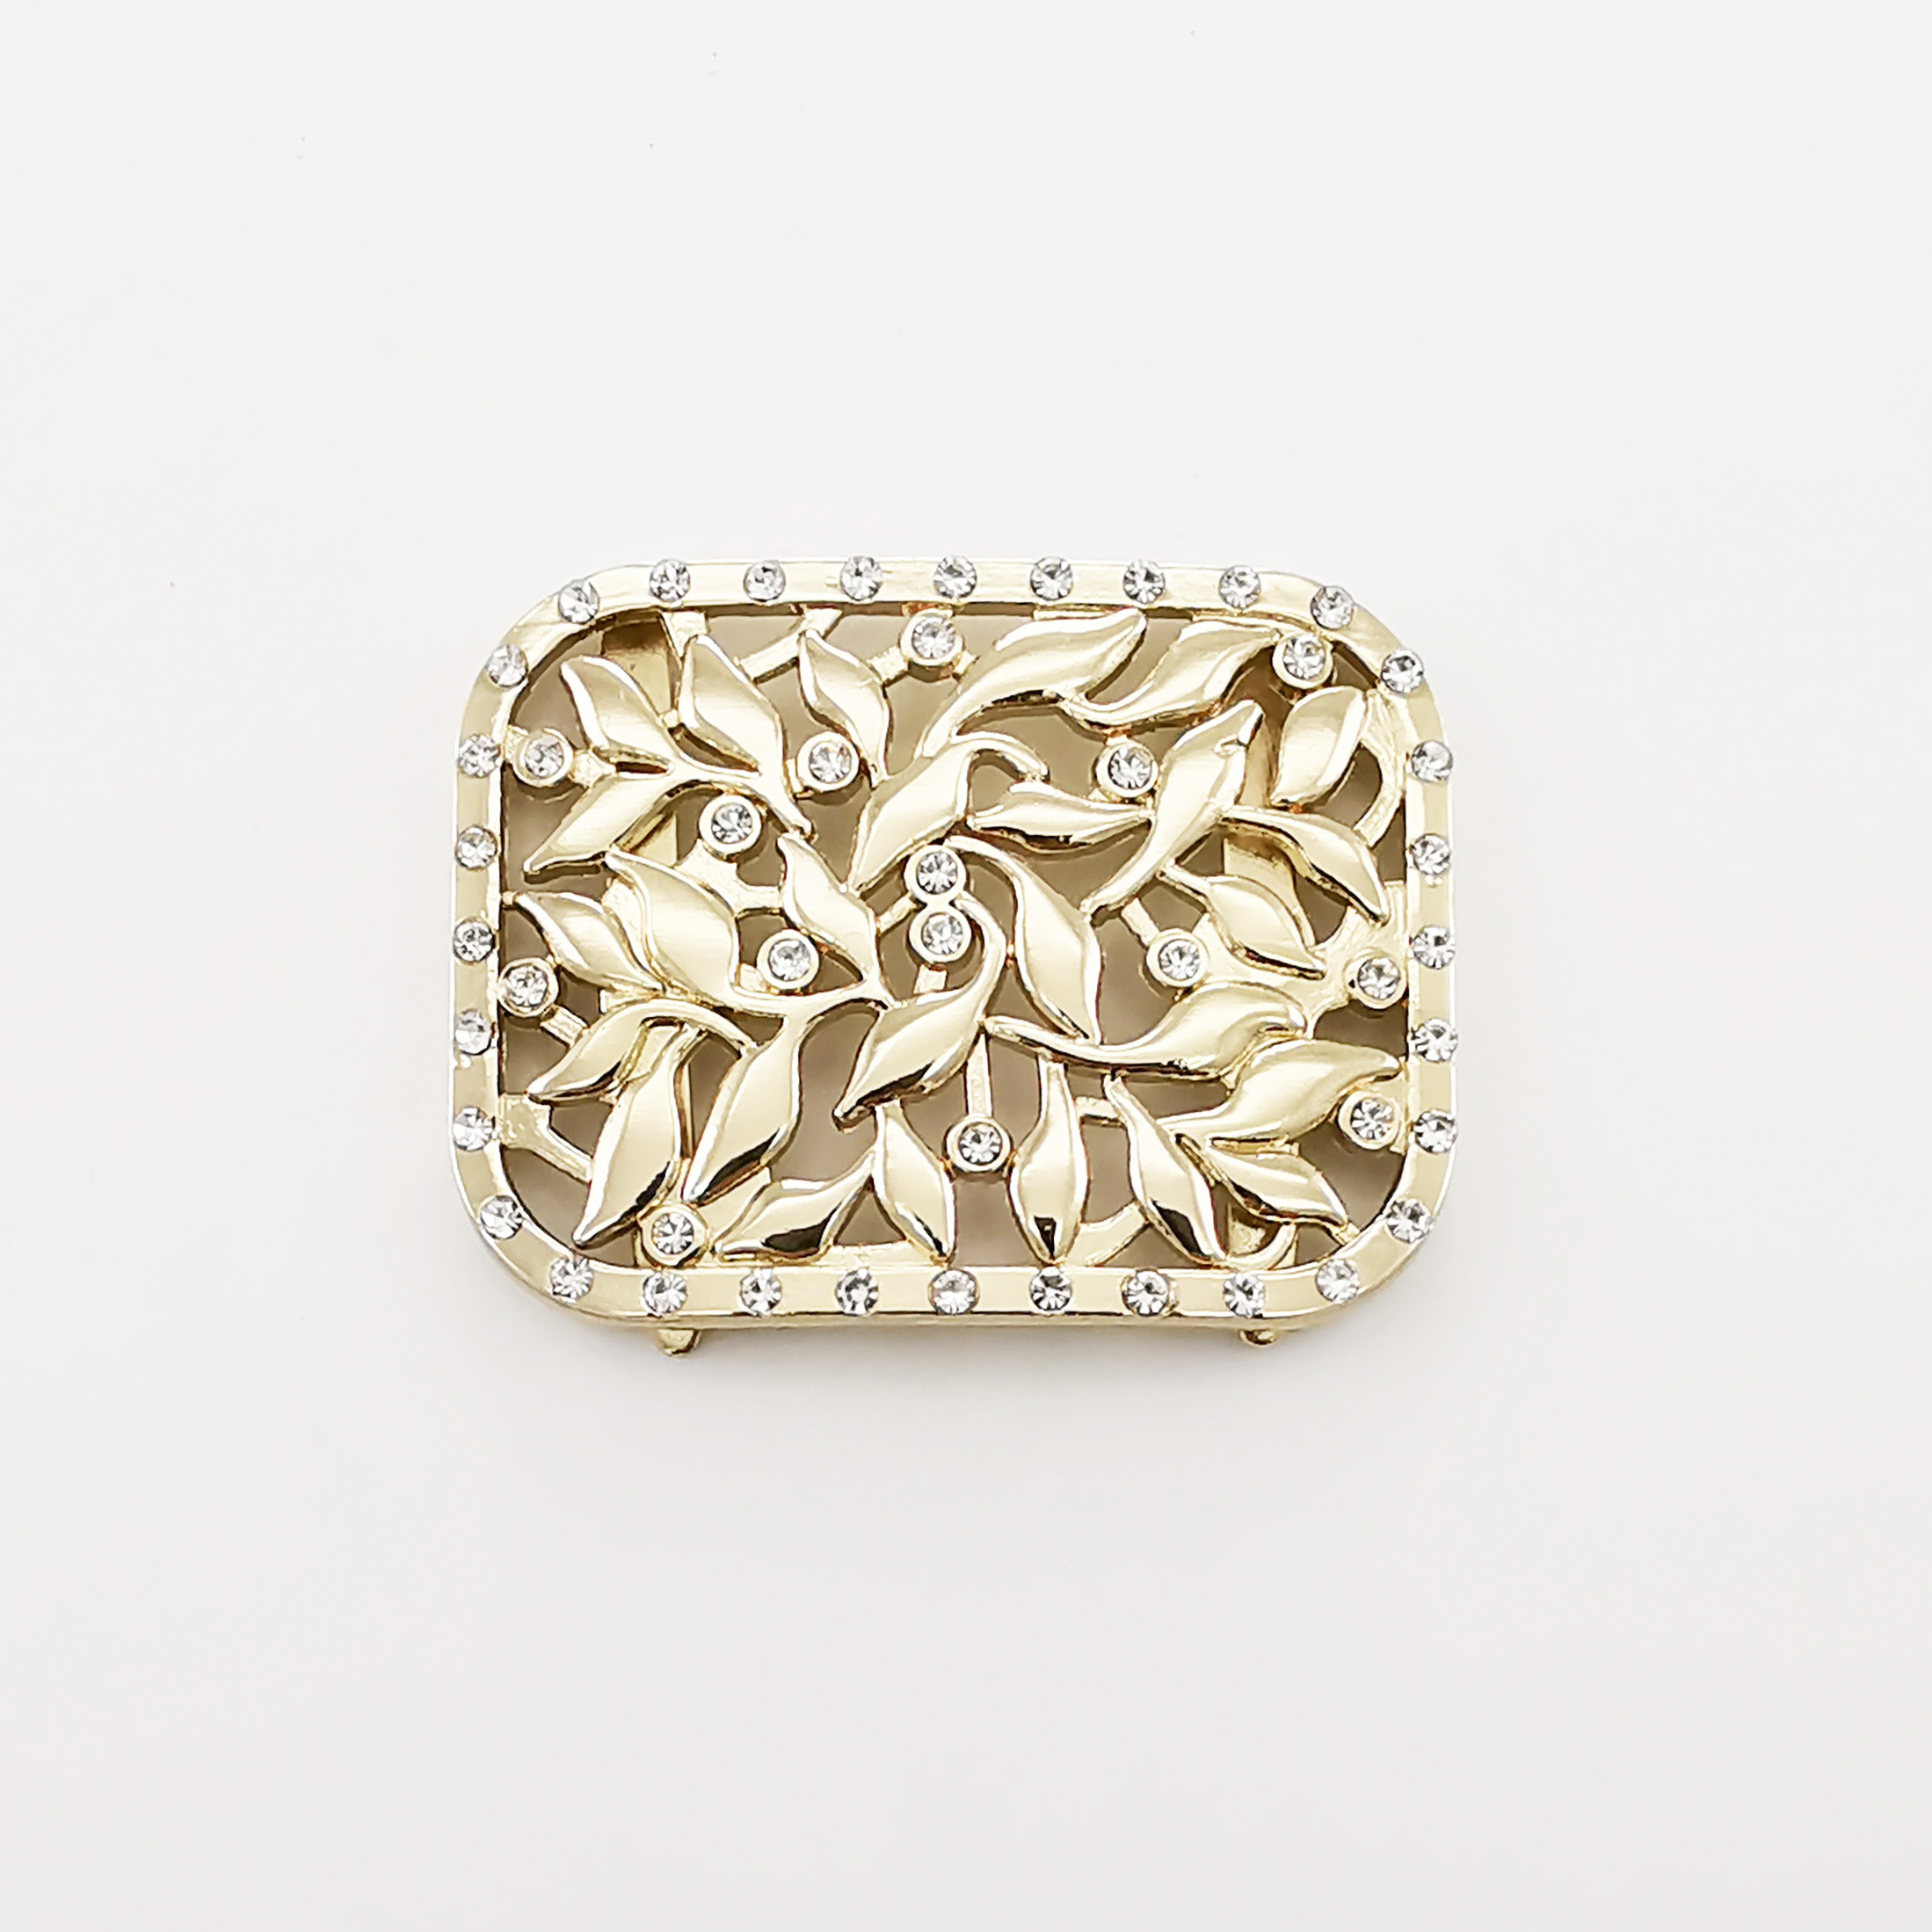 WOMENS SHOE CLIP  ACCESSORIES WITH DIAMOND STONE